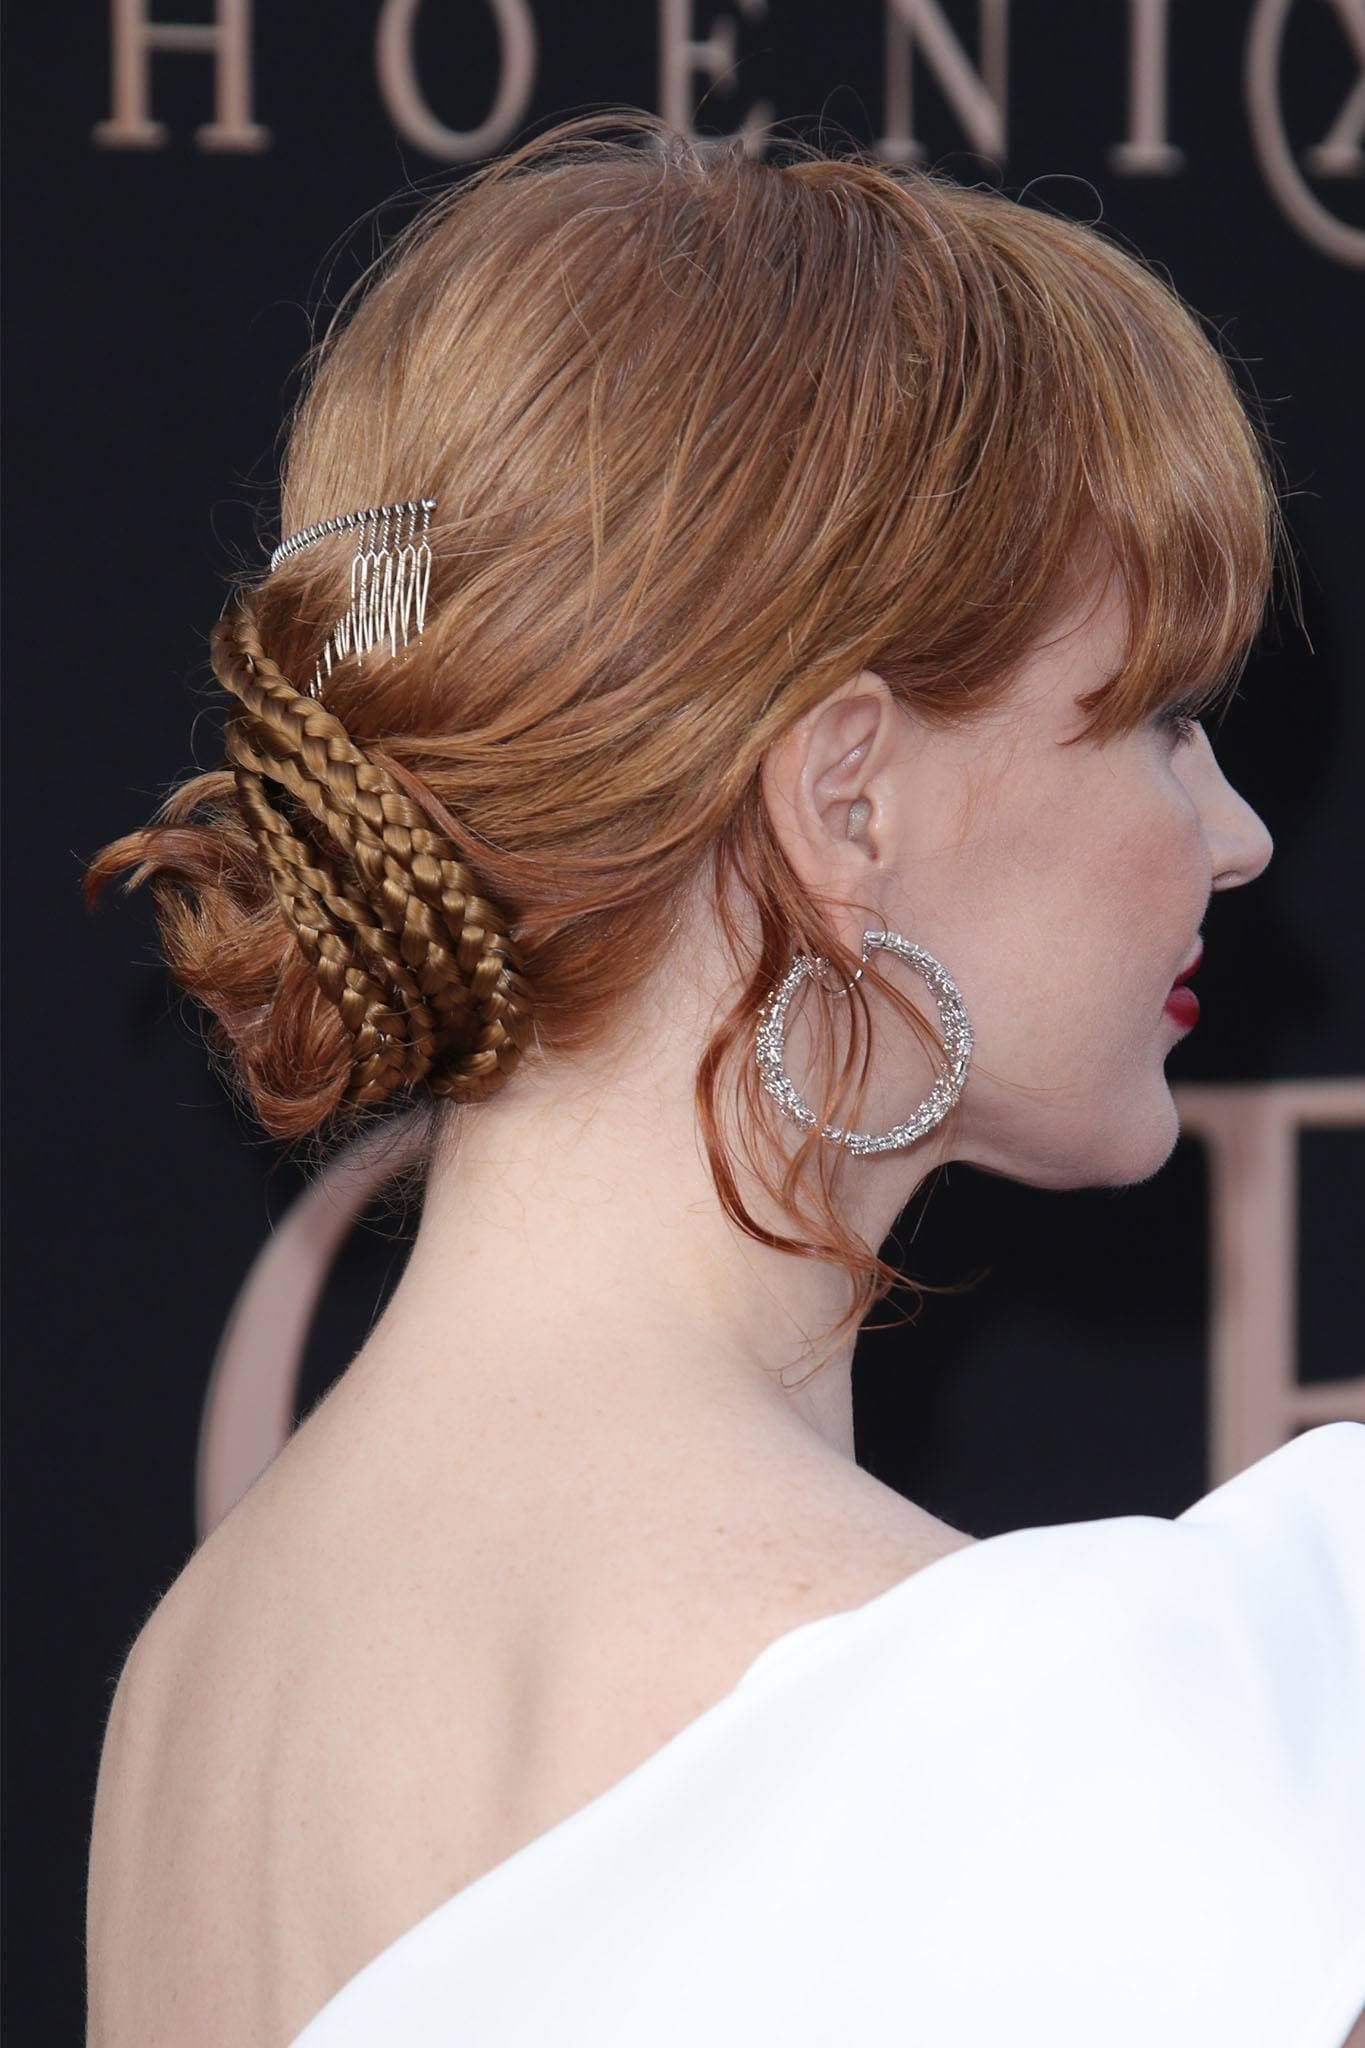 Jessica Chastain con peinado recogido con trenzas